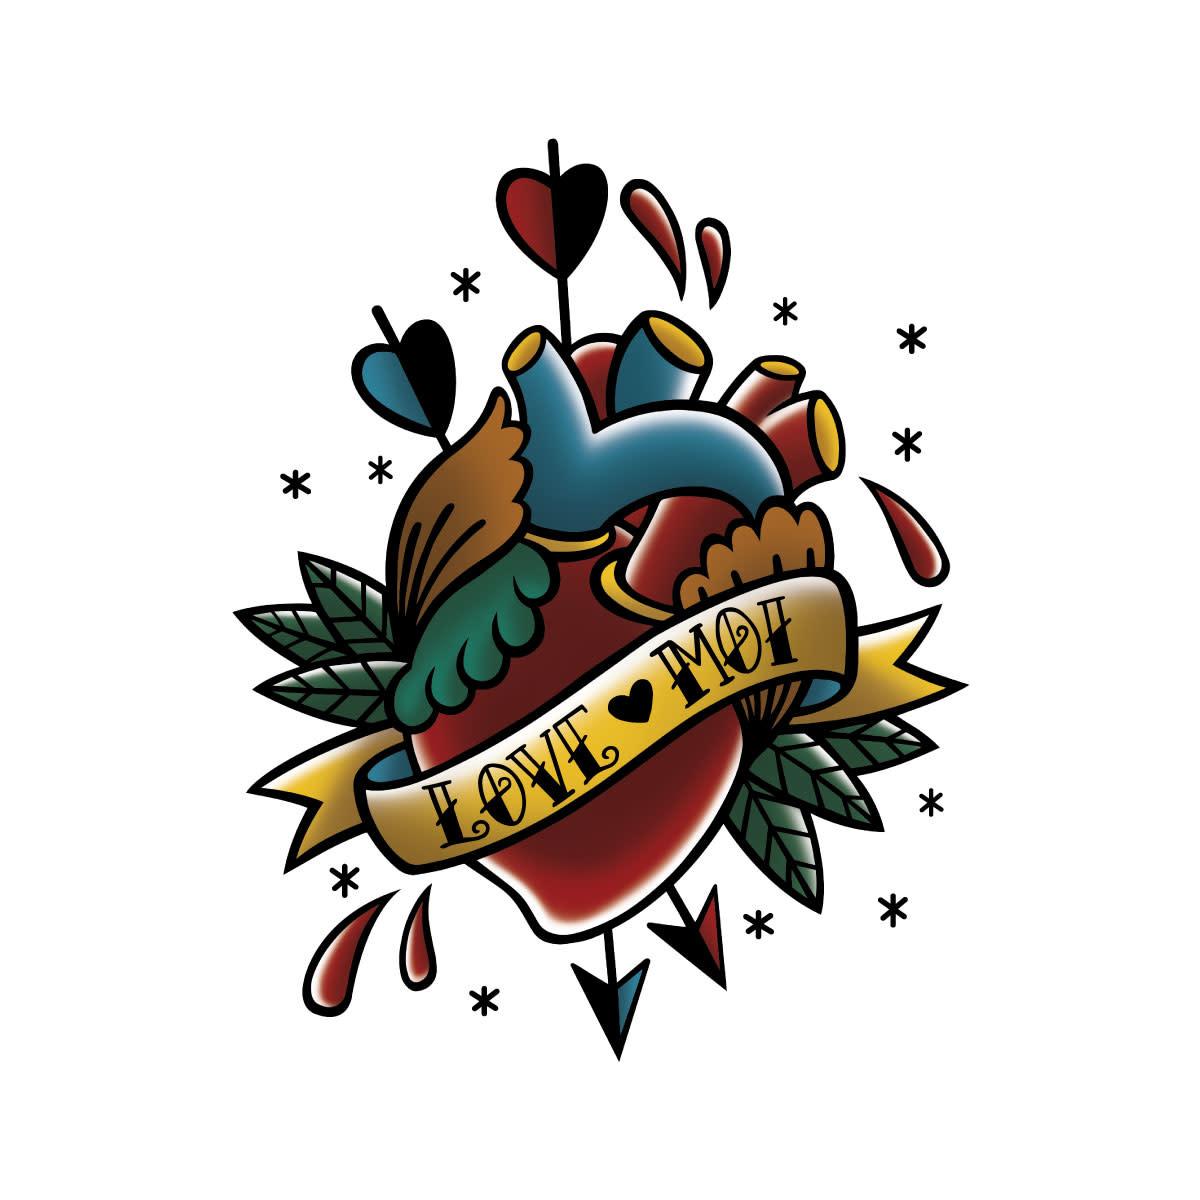 Les Tatoués Tatouage 3X4: À cœur ouvert